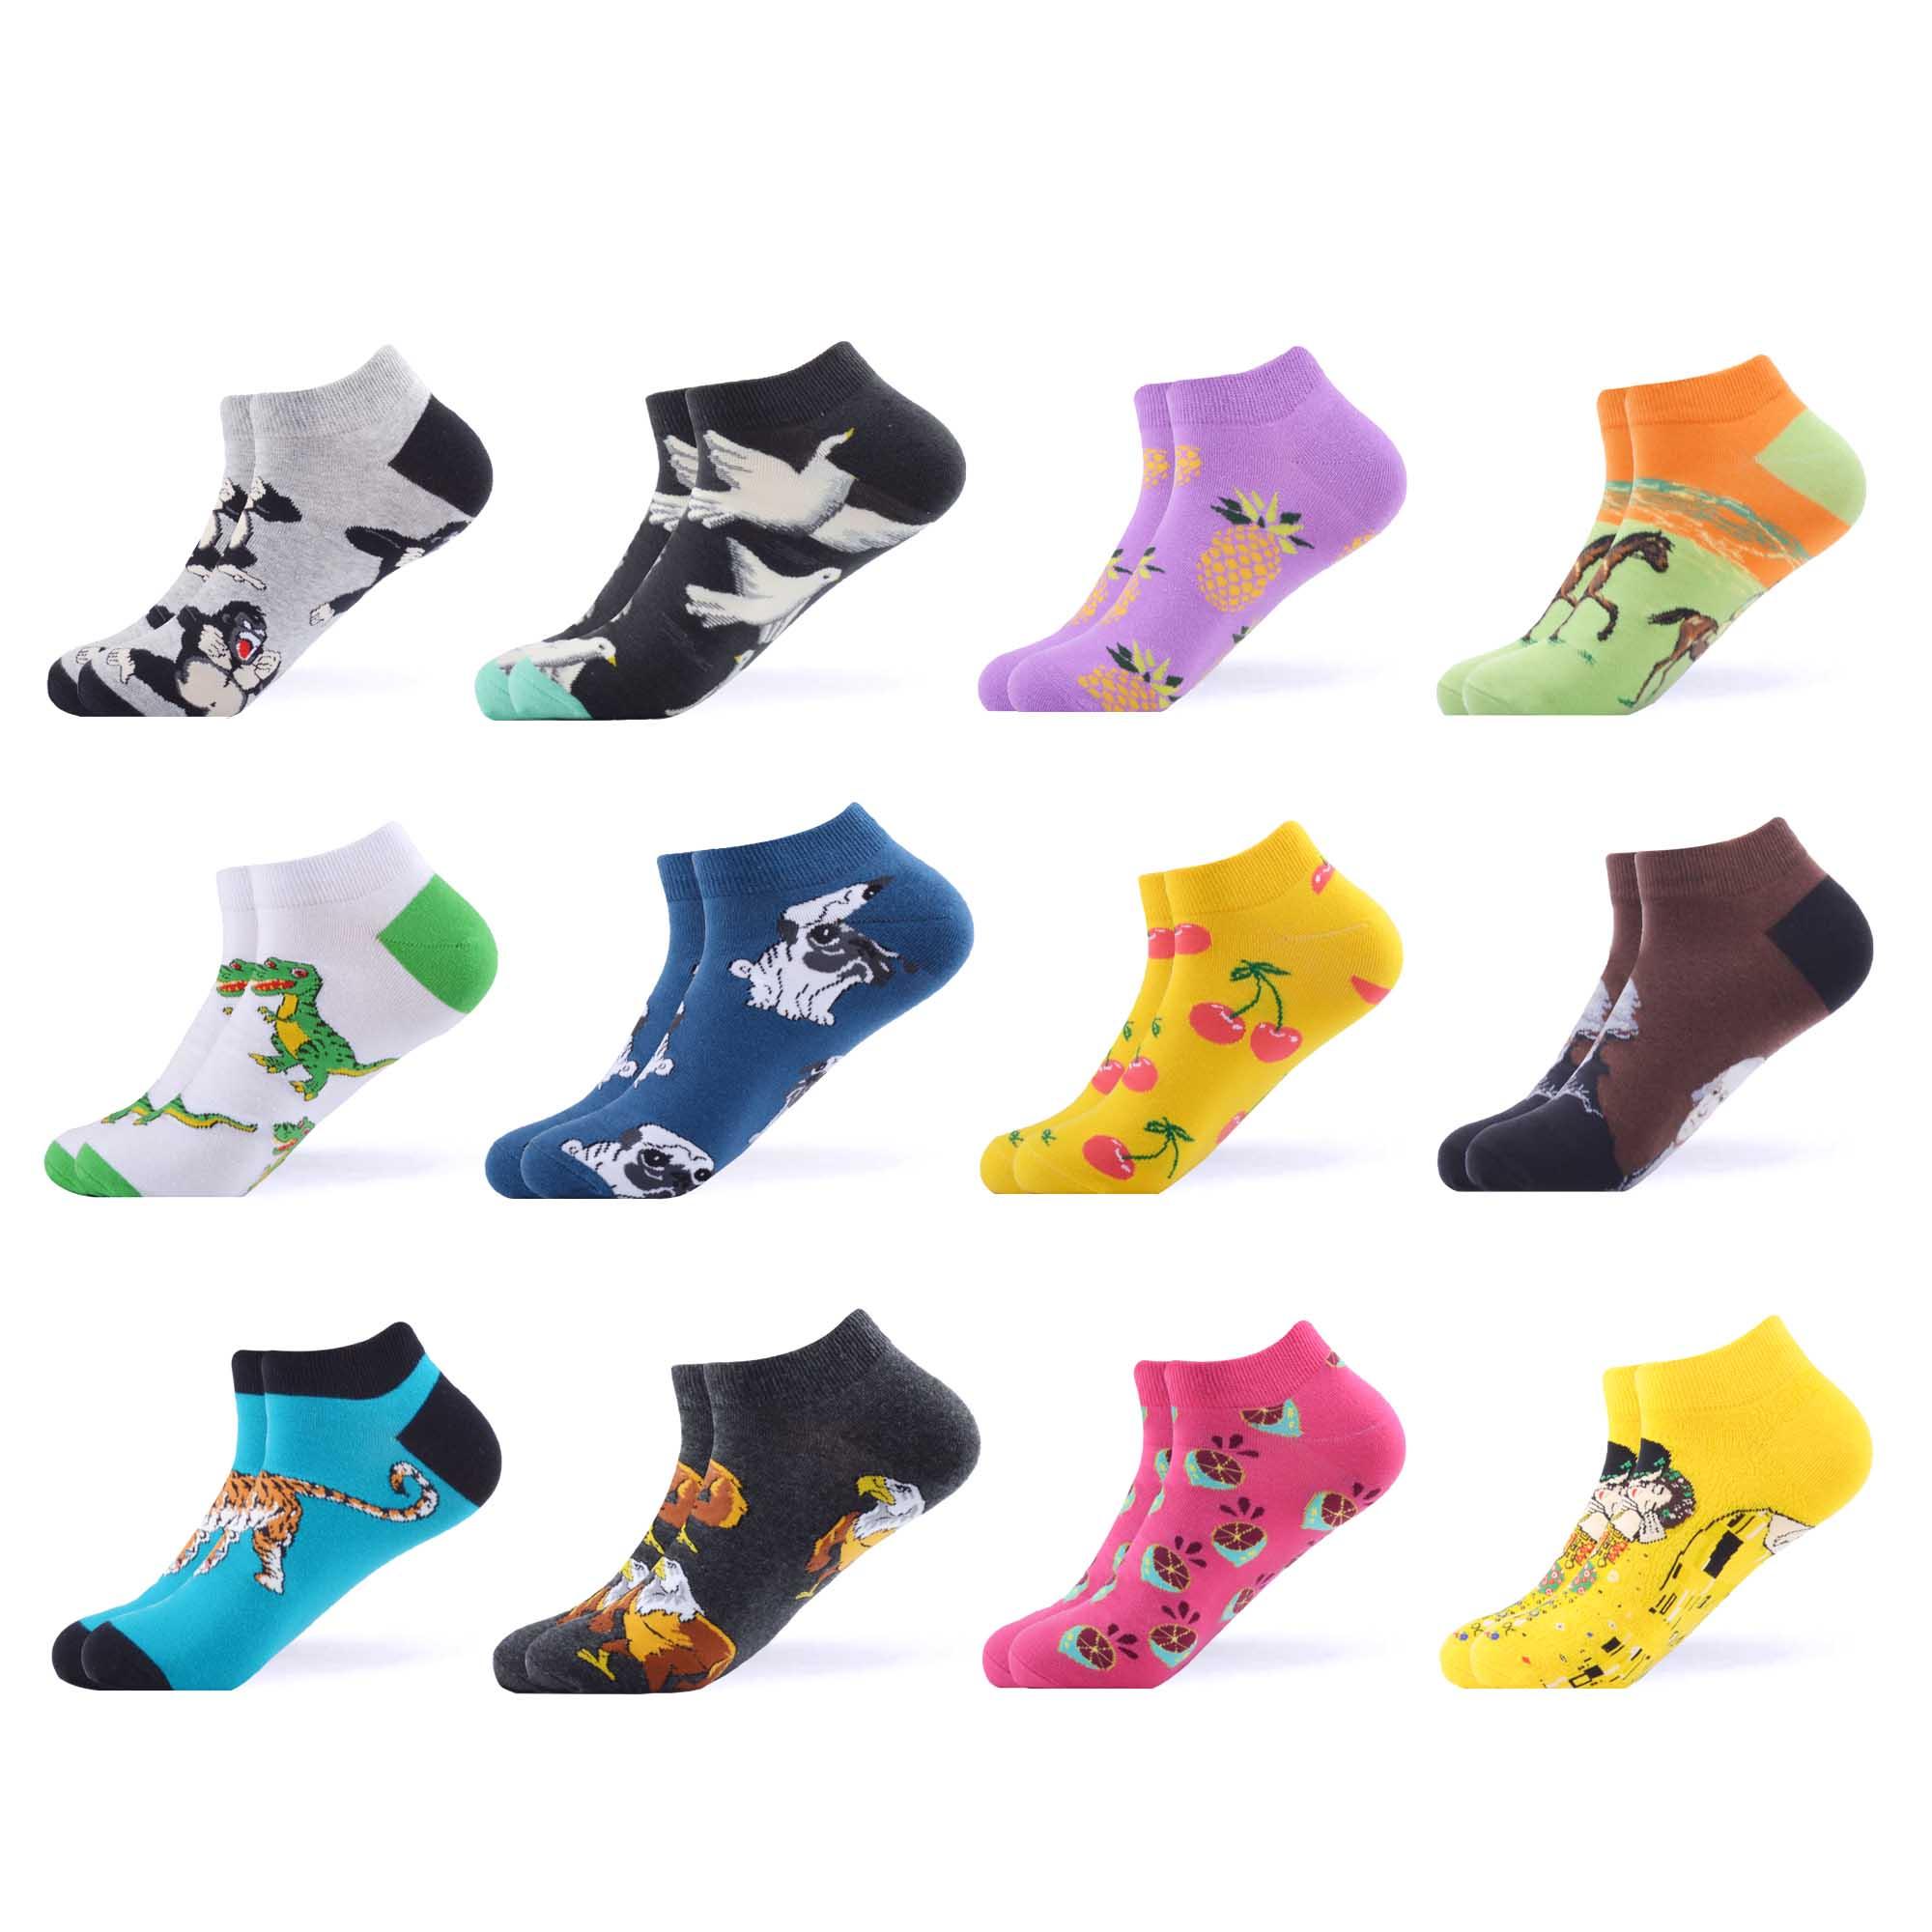 SANZETTI 12 Pairs/Lot Women Crew Socks Casual Combed Cotton Ankle Socks Happy Hip Hop Harajuku Short Socks Dress Boat Socks